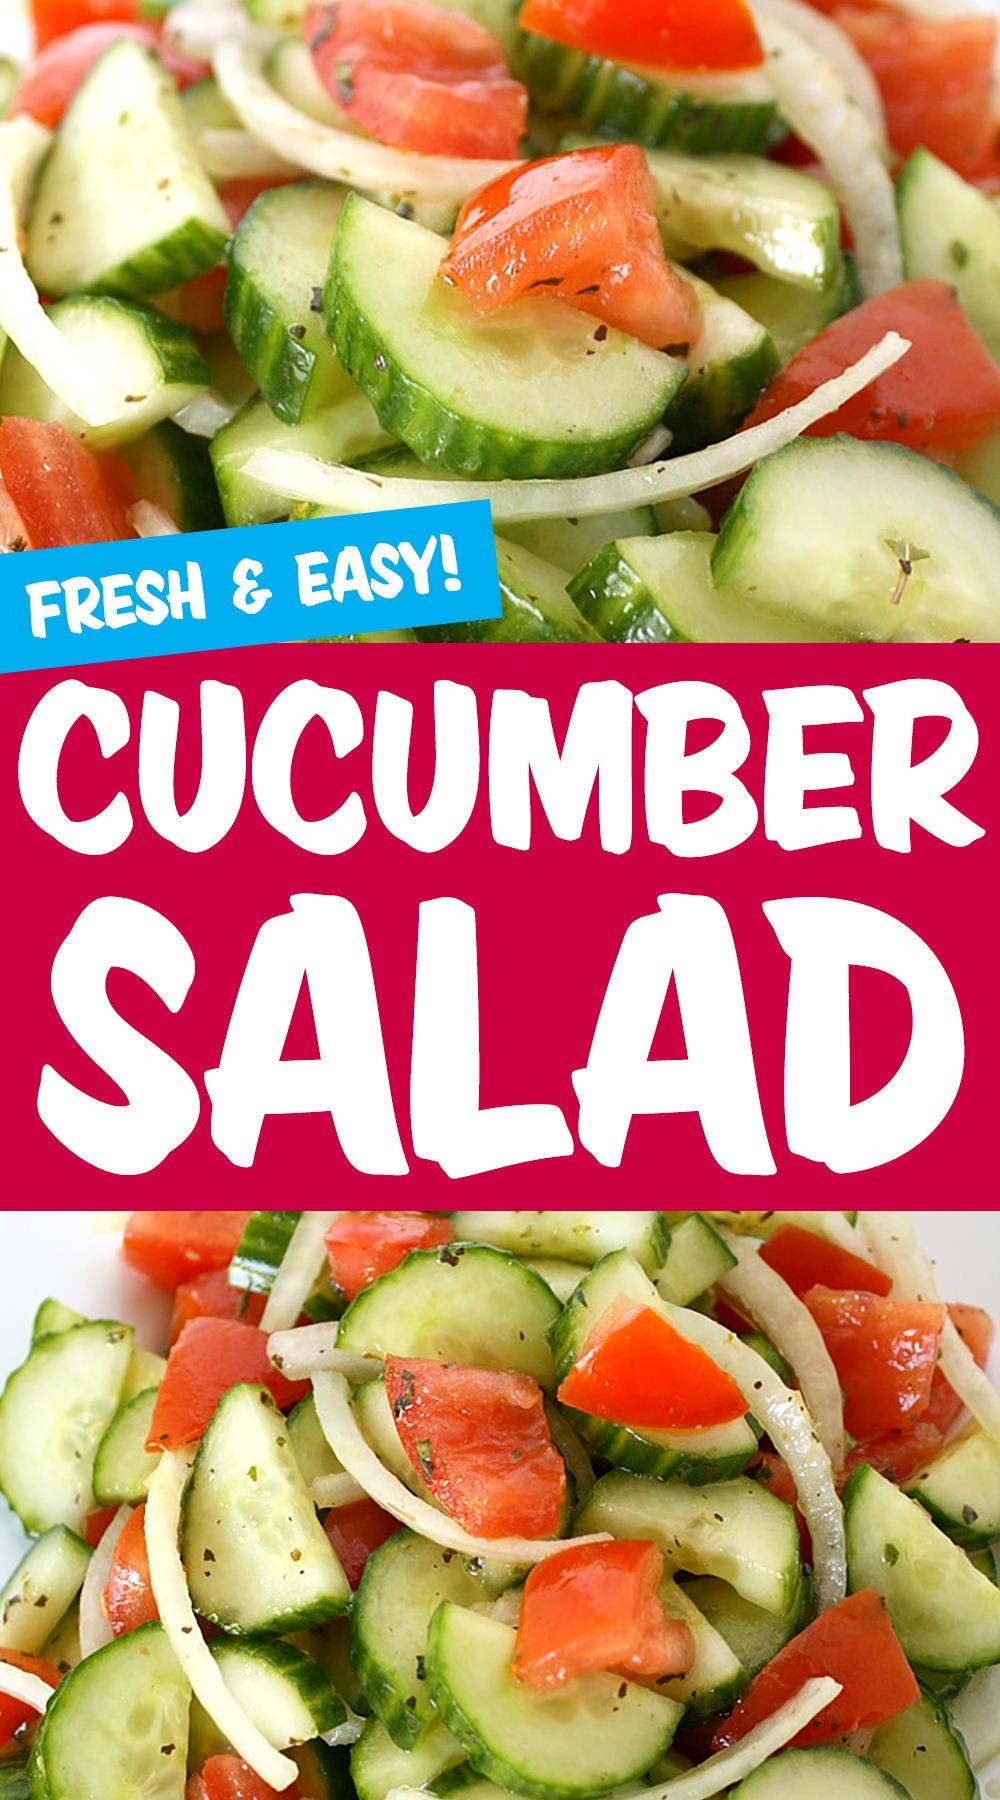 Cucumber salad photo collage